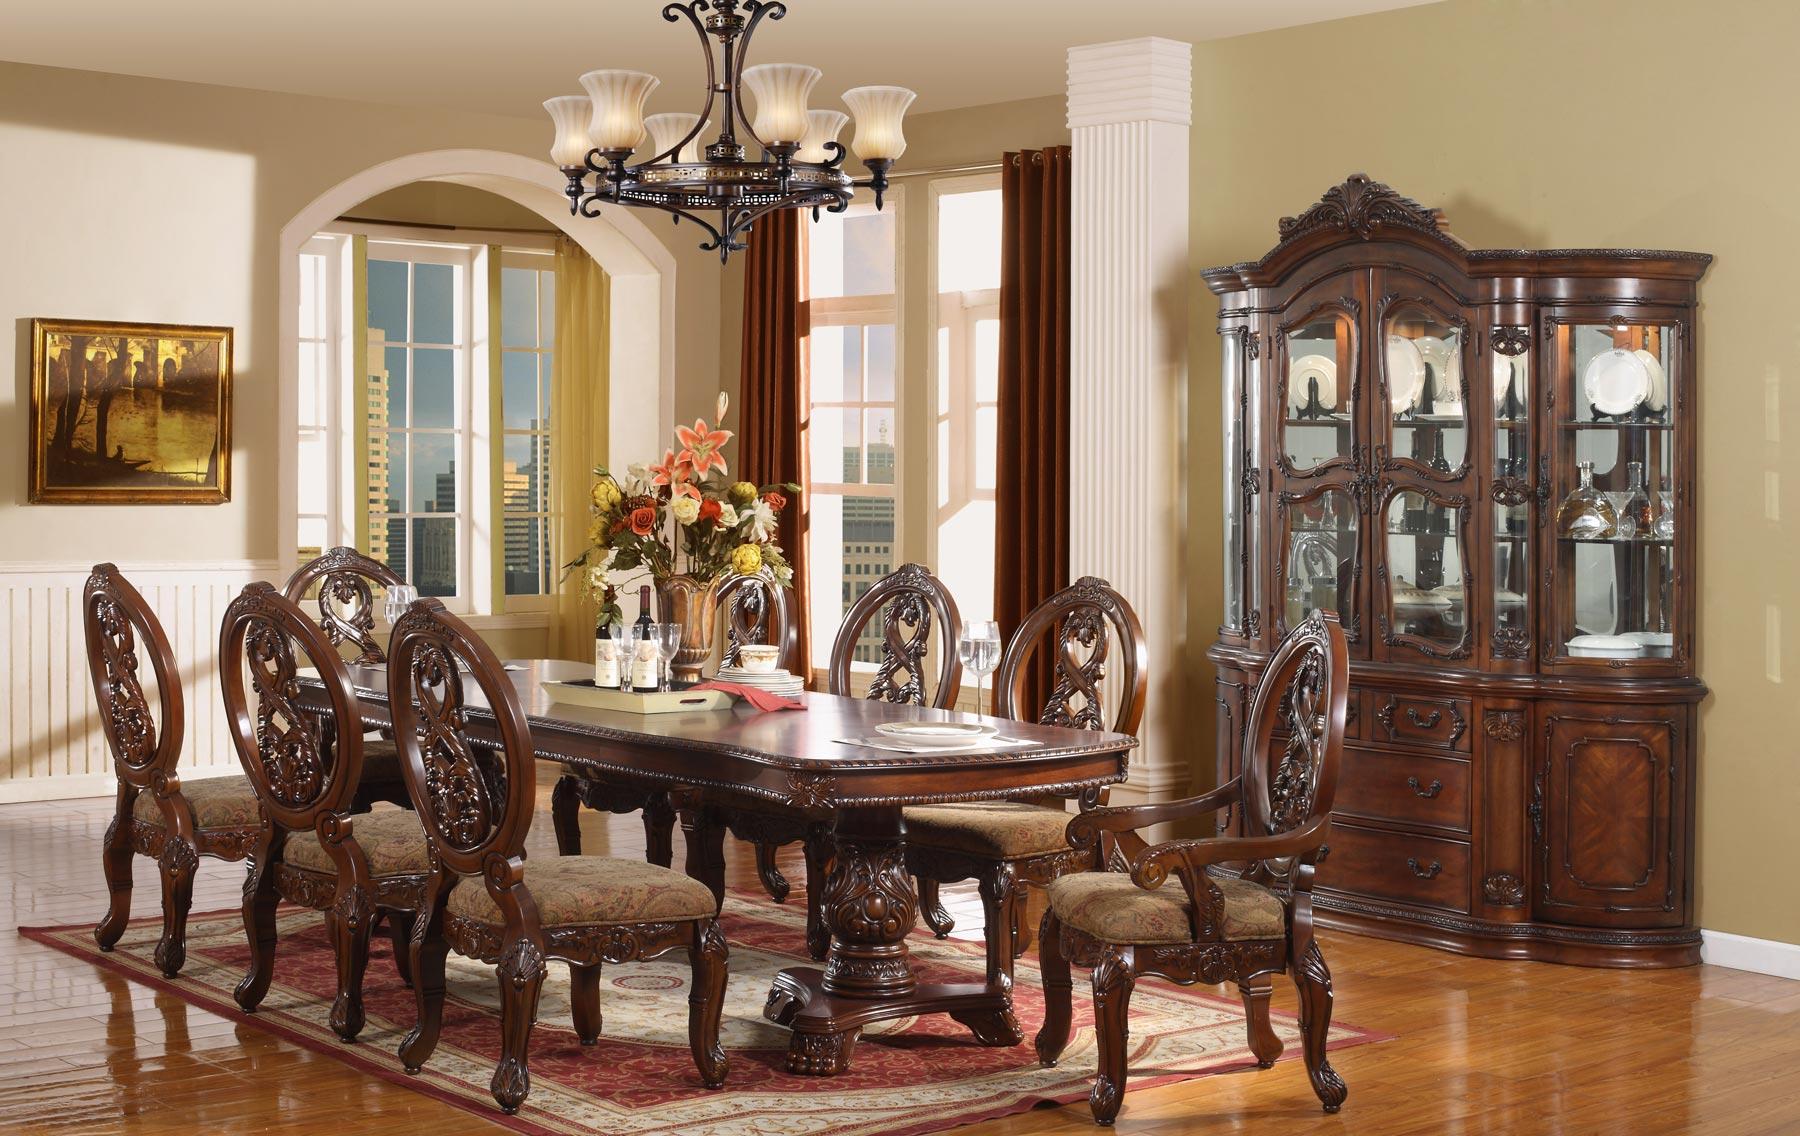 Gambia 7 Piece Dining Room Set | Gonzalez Furniture